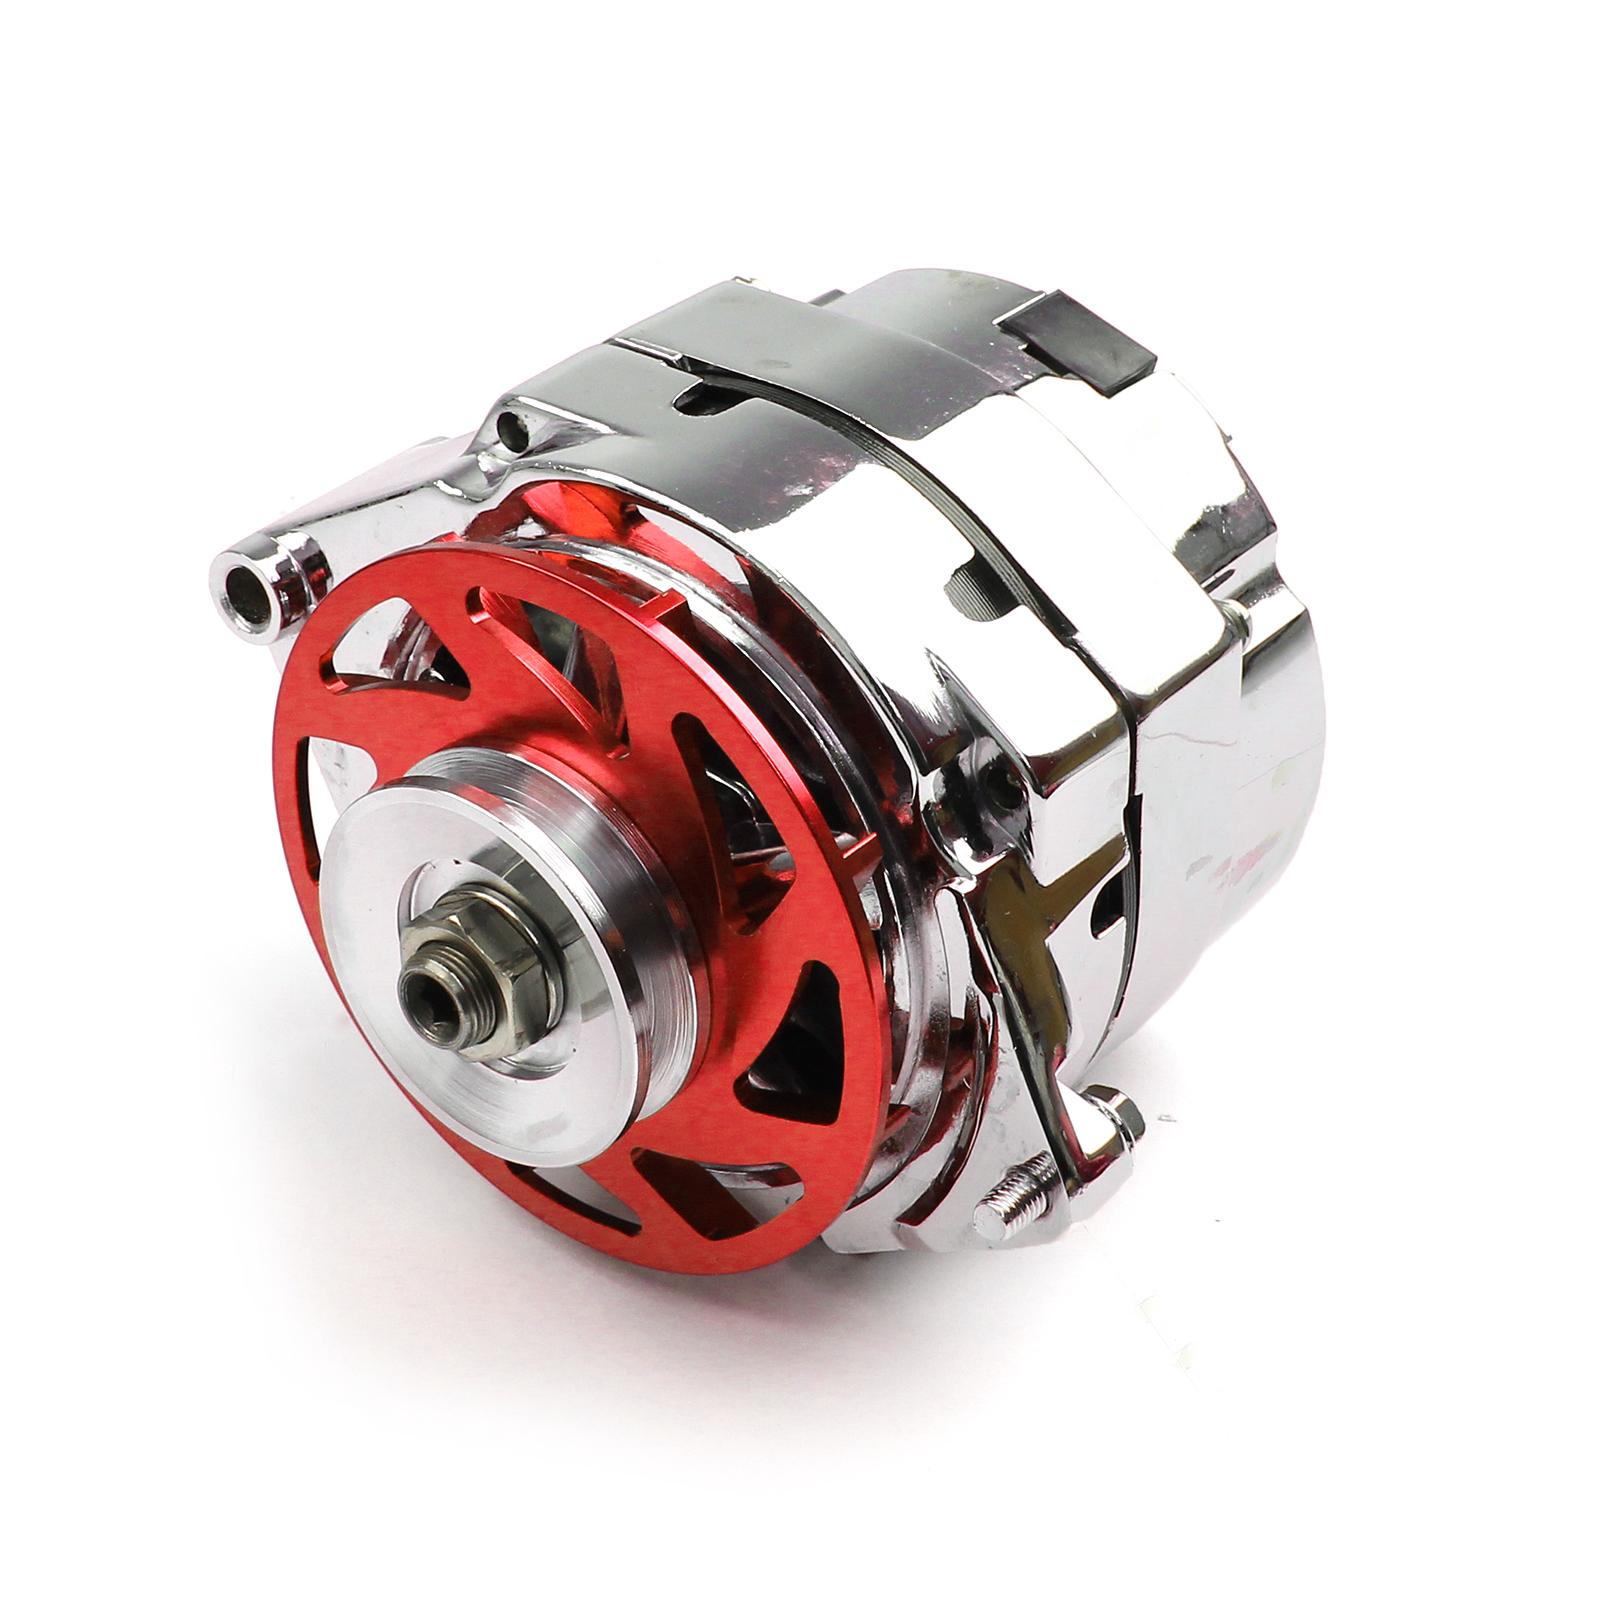 GM 100 Amp 1 Wire Internal Regulator High Output Alternator w/ Billet Fan Red